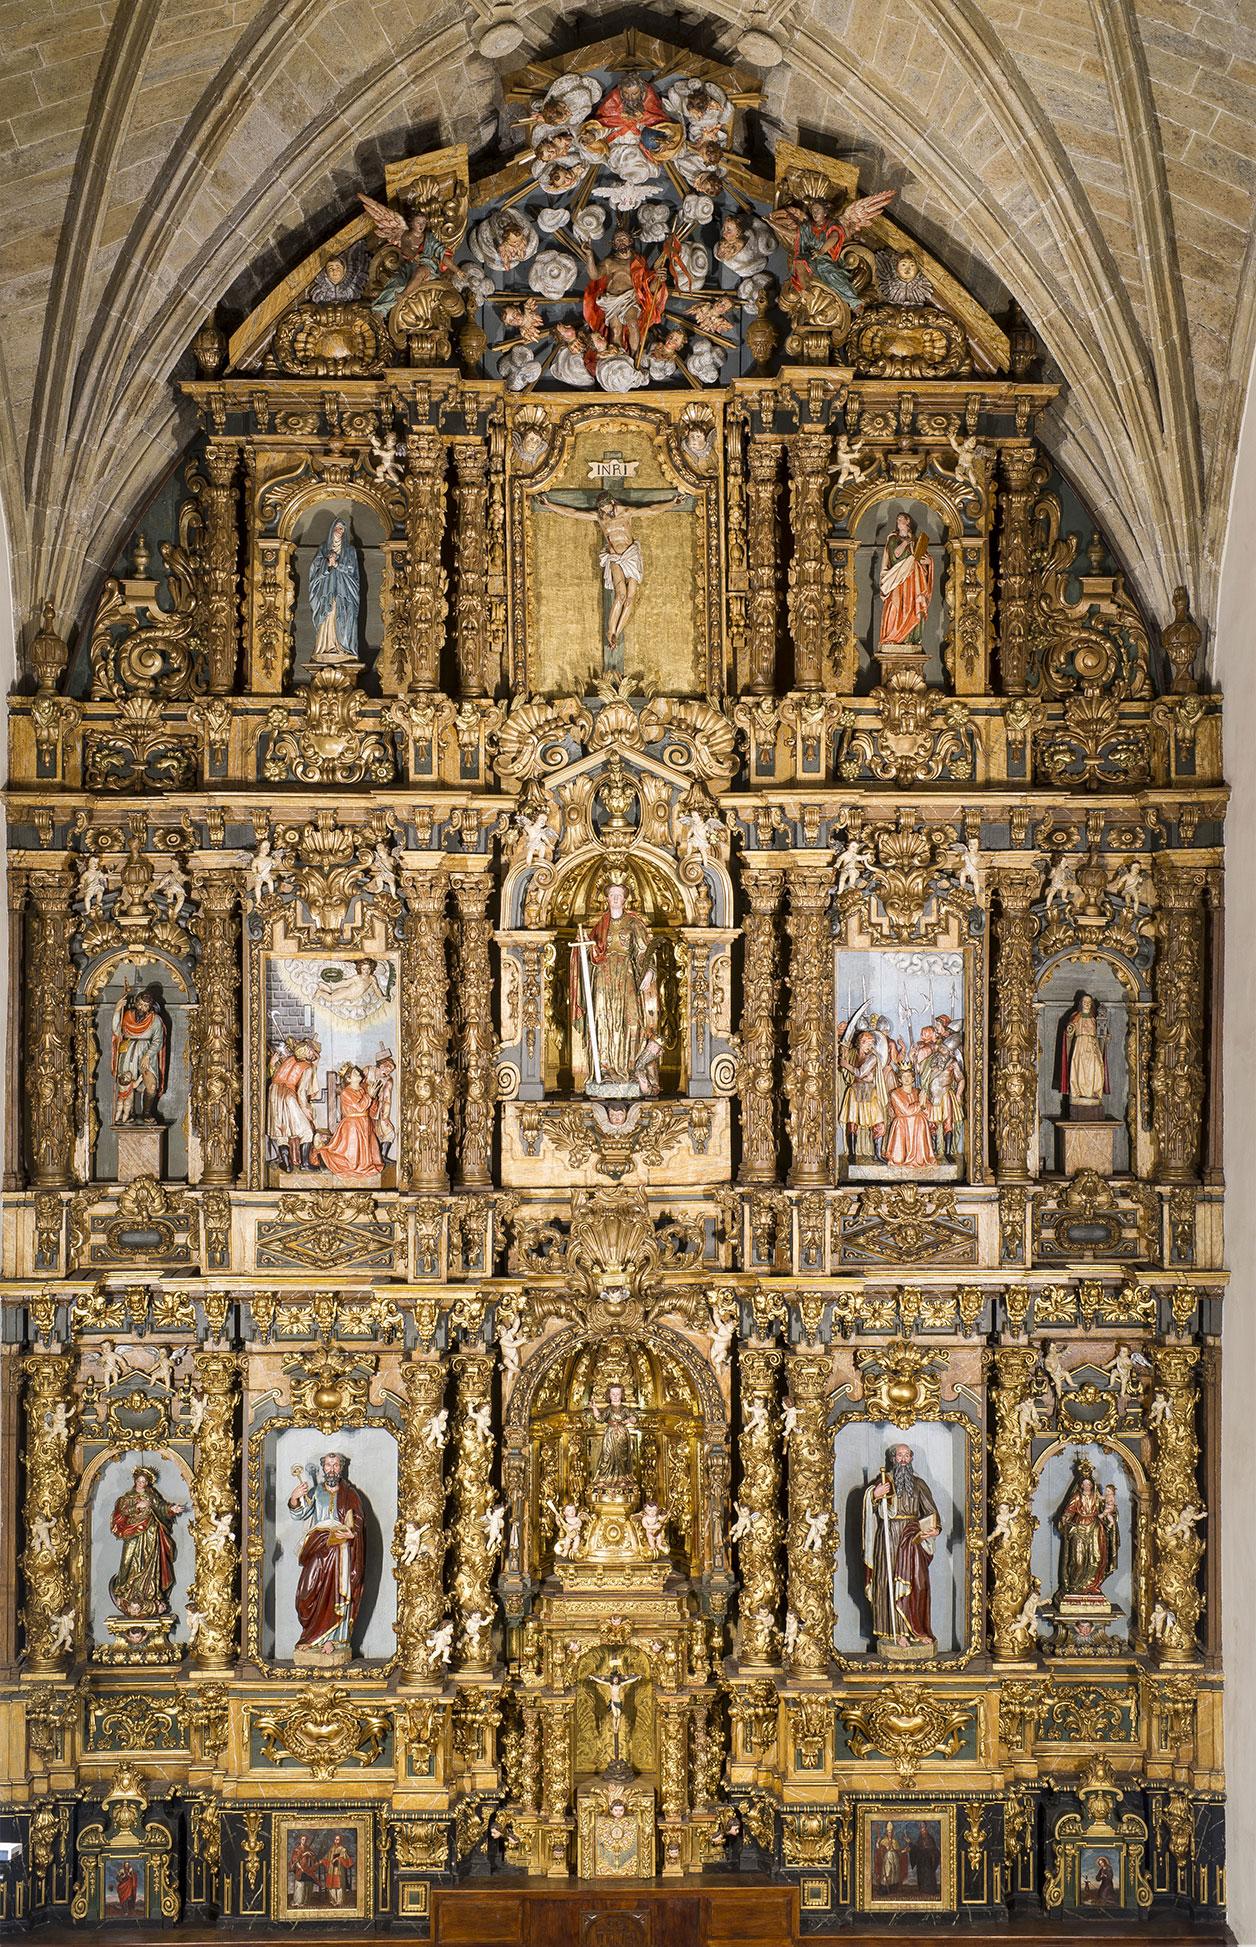 Restauration, zaharberritzea. Donostia- San Sebastián, Gipuzkoa, Pyrénées-Atlantiques, Navarra